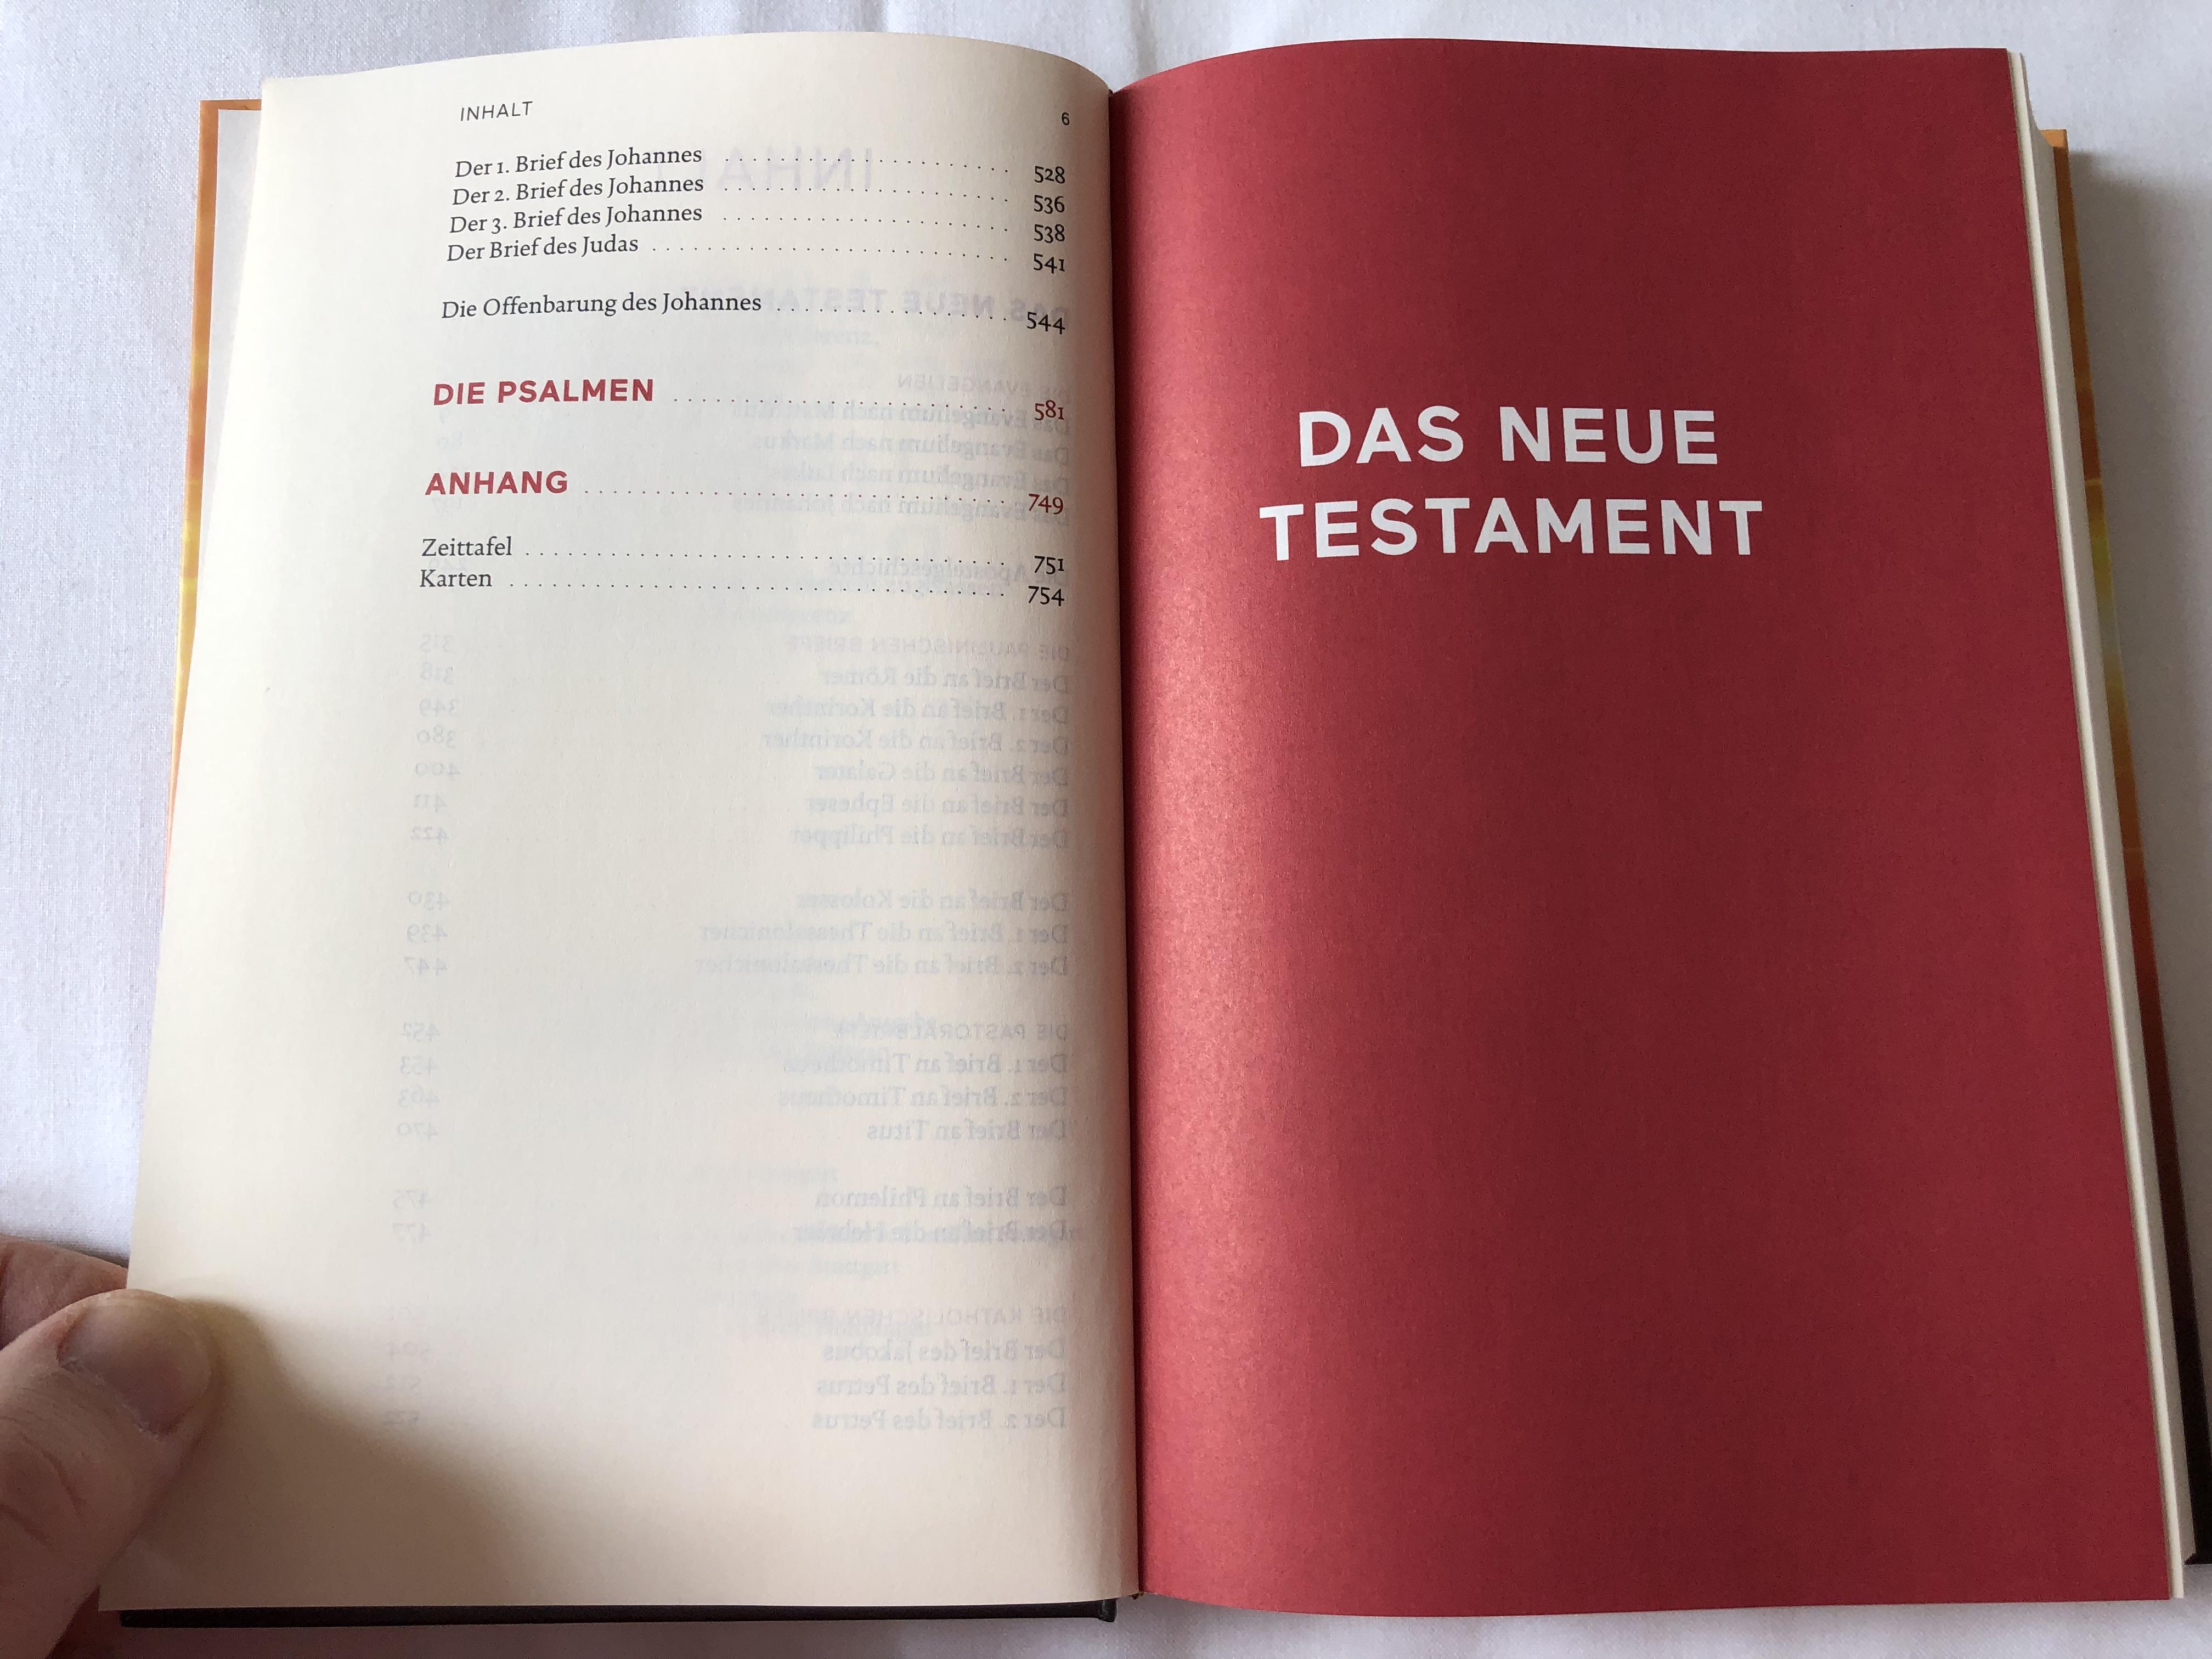 das-neue-testament-und-die-psalmen-einheits-bersetzung-german-language-new-testament-and-psalms-unitary-translation-book-introductions-references-notes-and-maps-hardcover-2018-kbw-6-.jpg